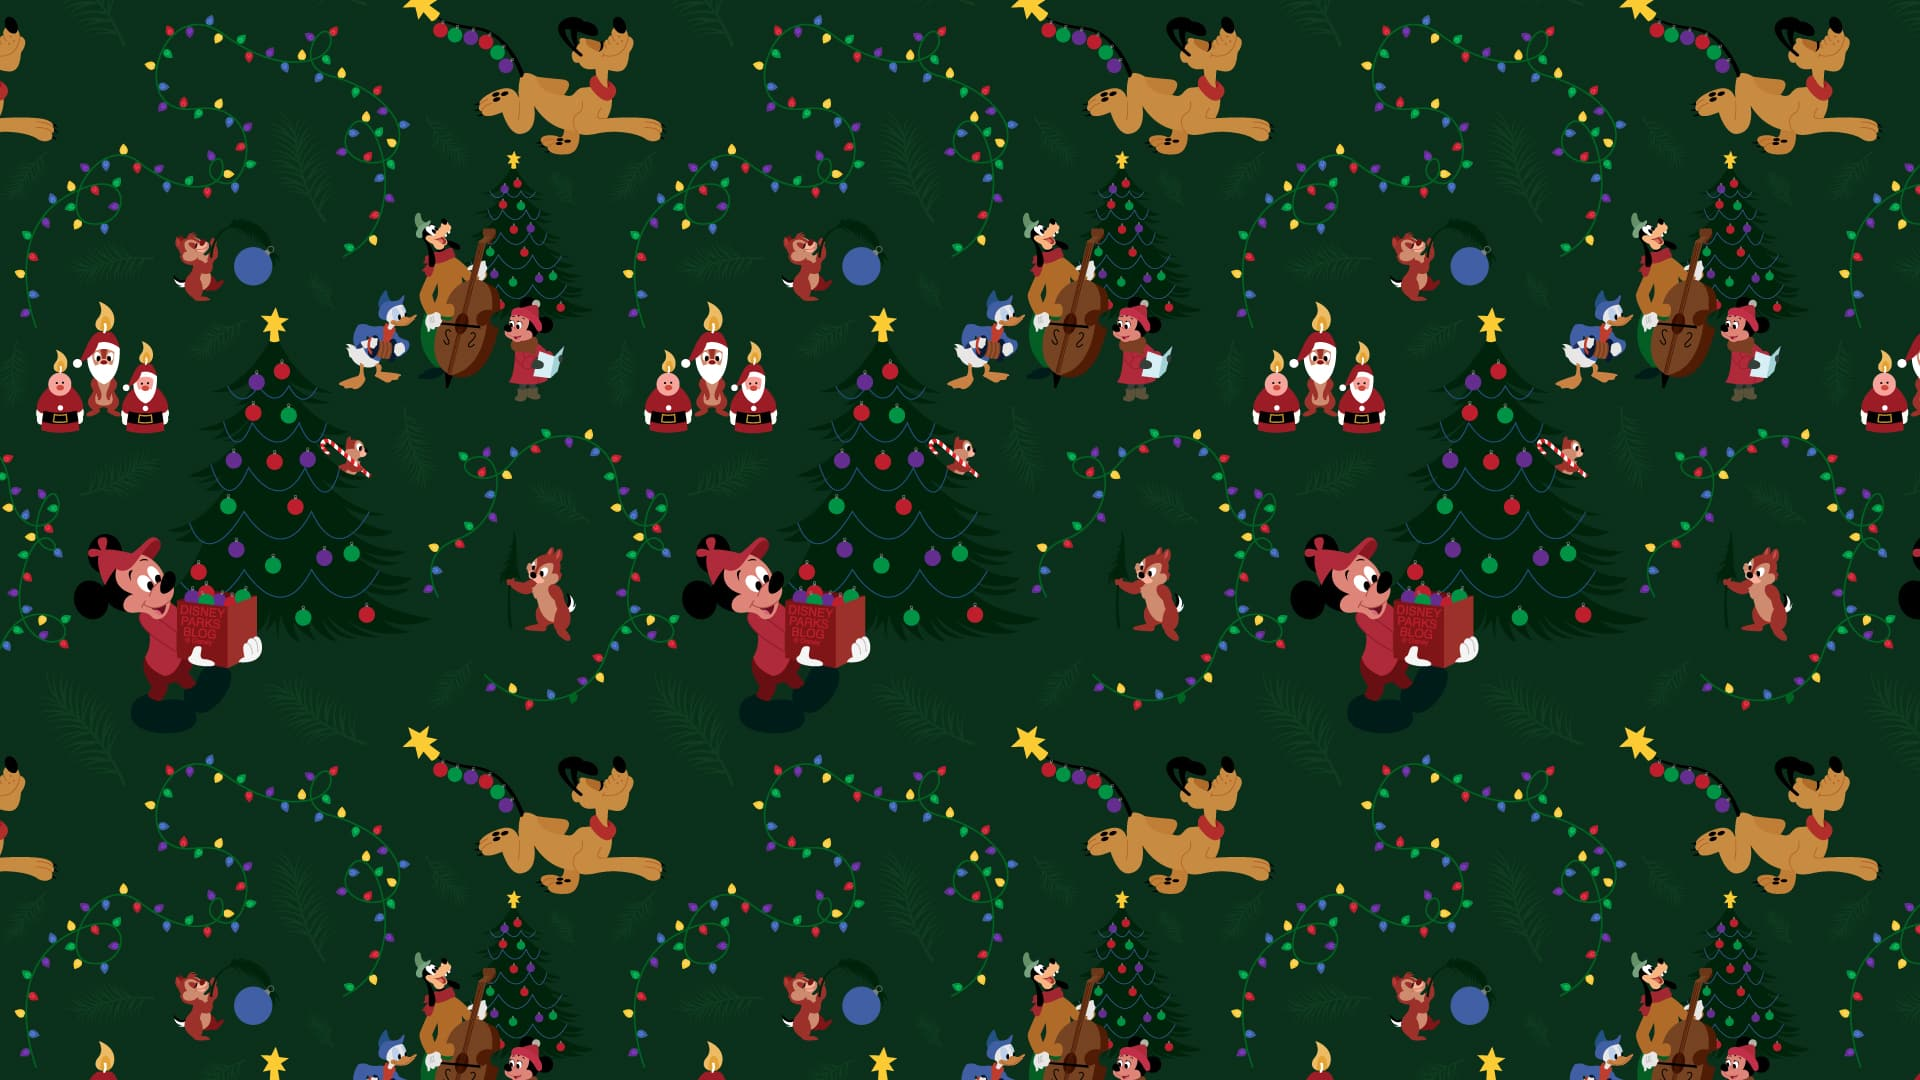 2019 Mickey Mouse Pluto Christmas Wallpaper Desktop Ipad Disney Parks Blog